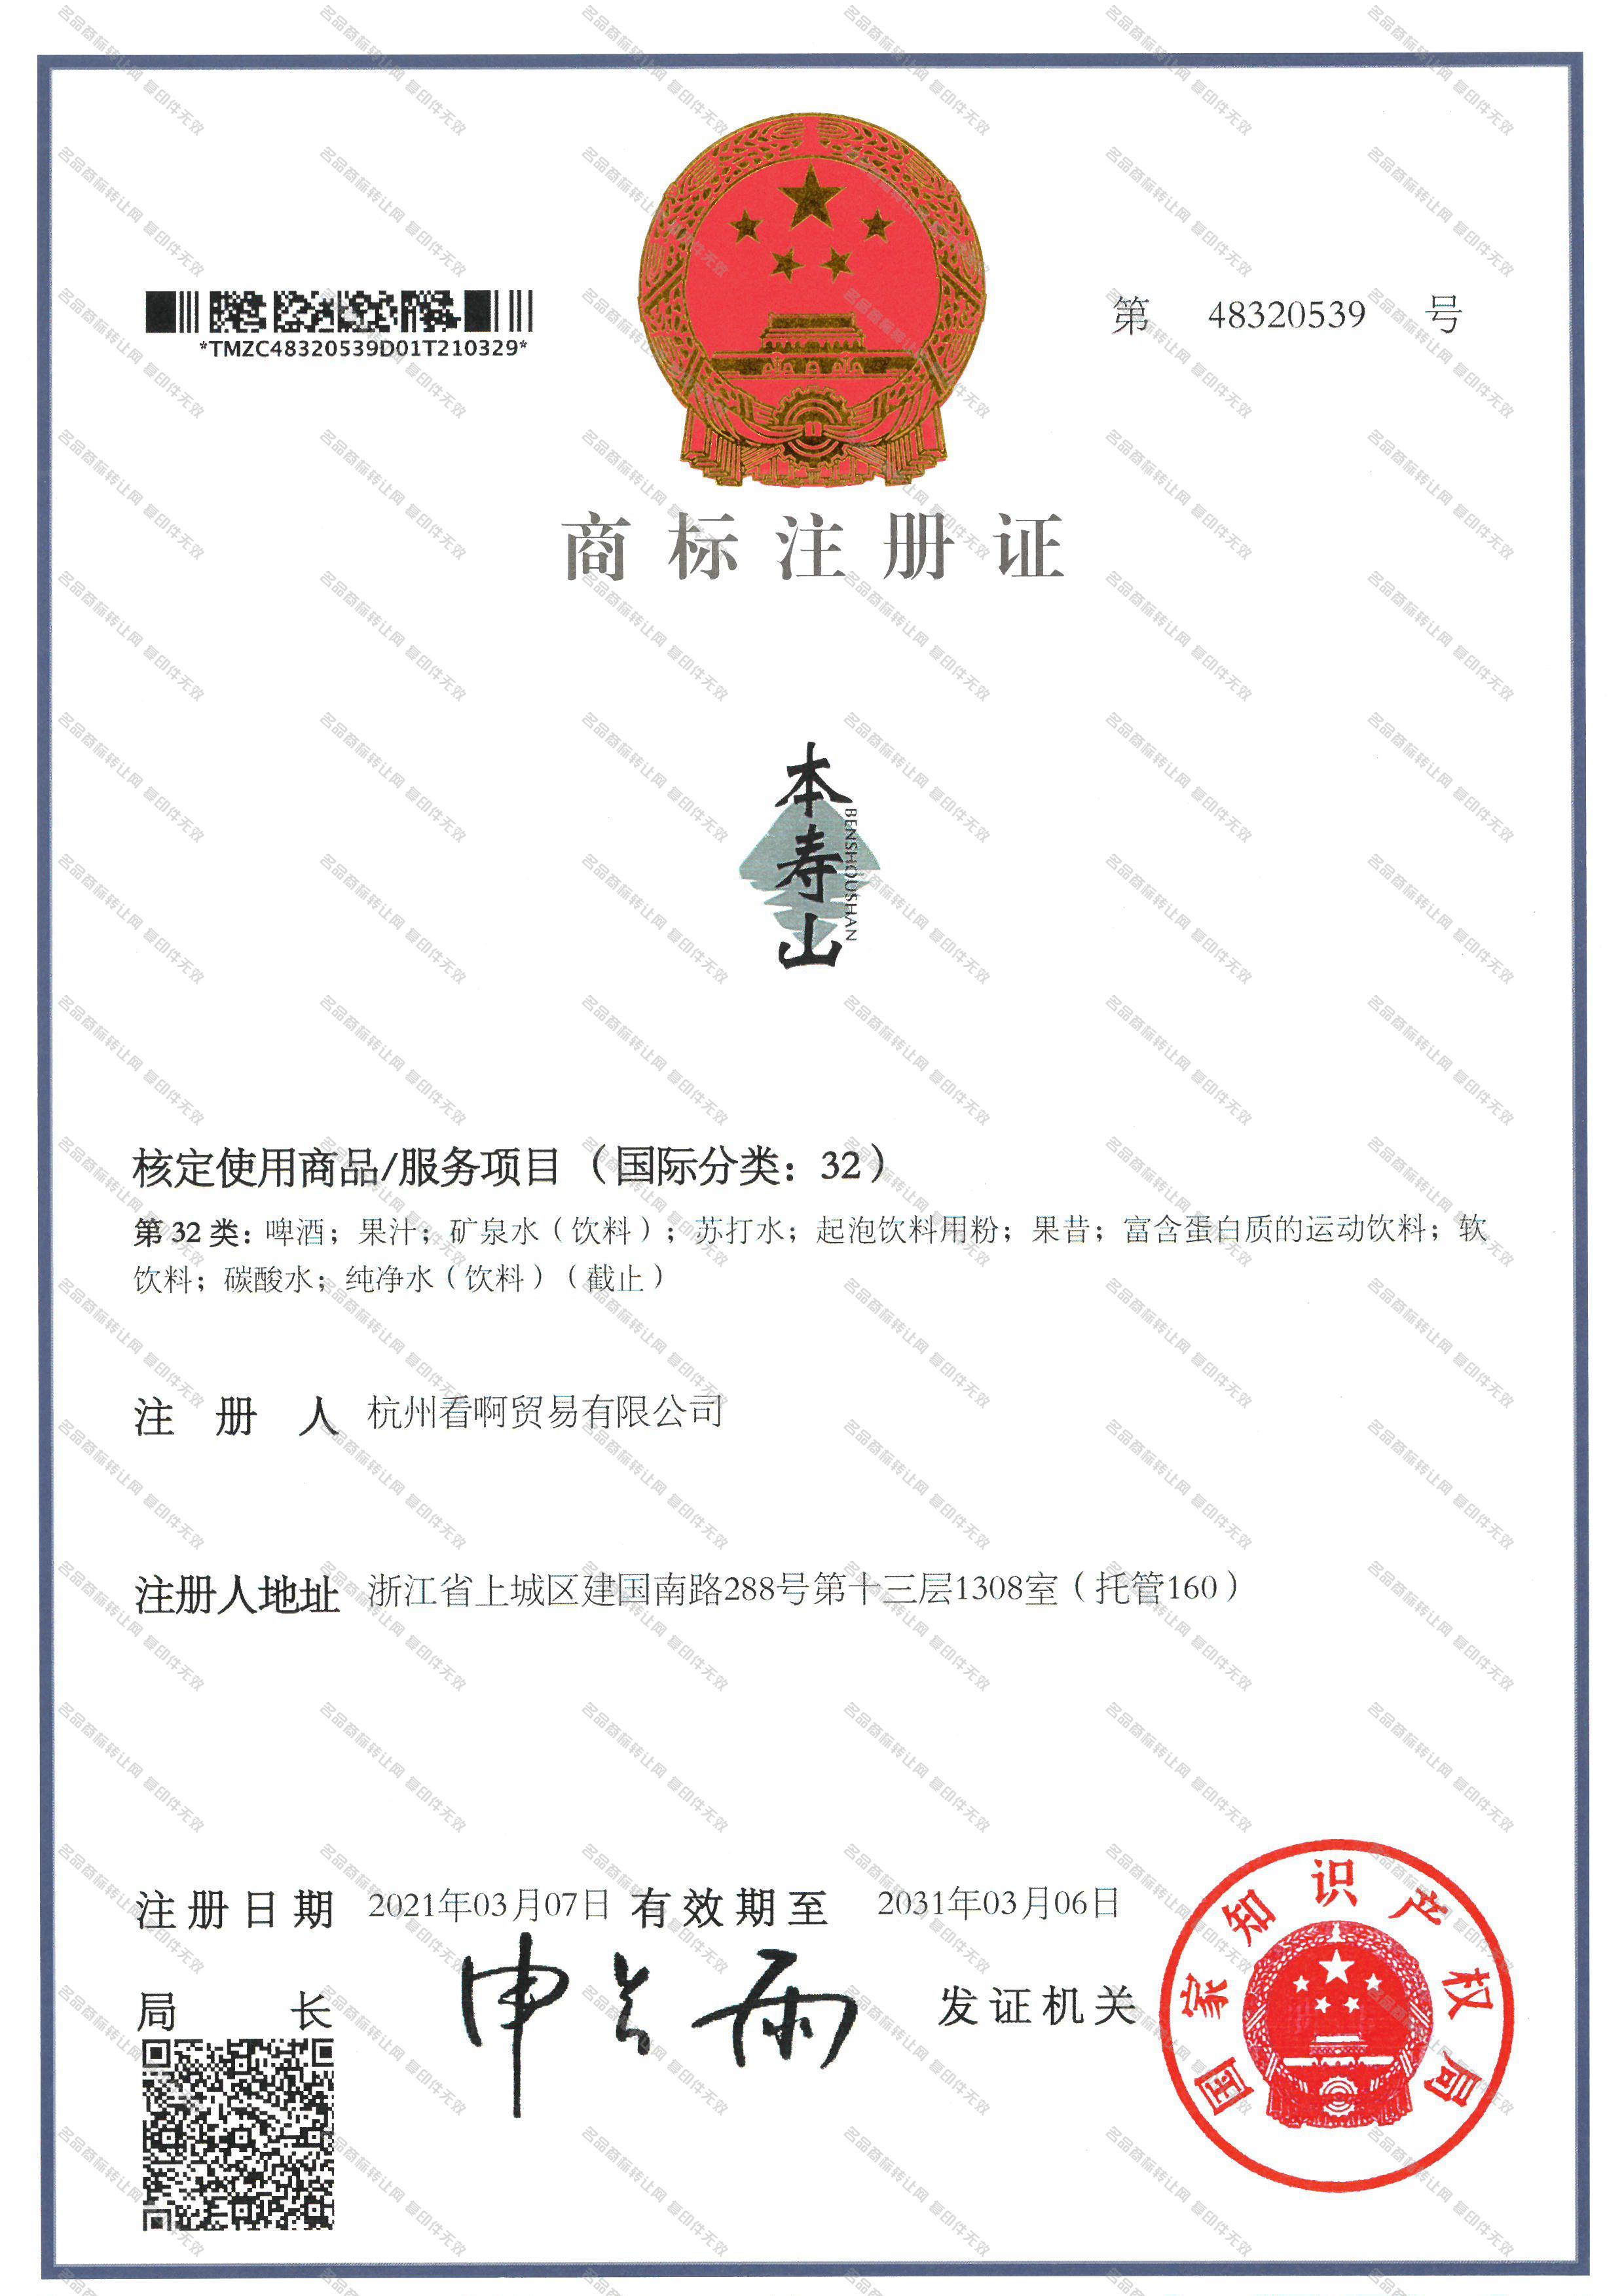 本寿山;BENSHOUSHAN注册证